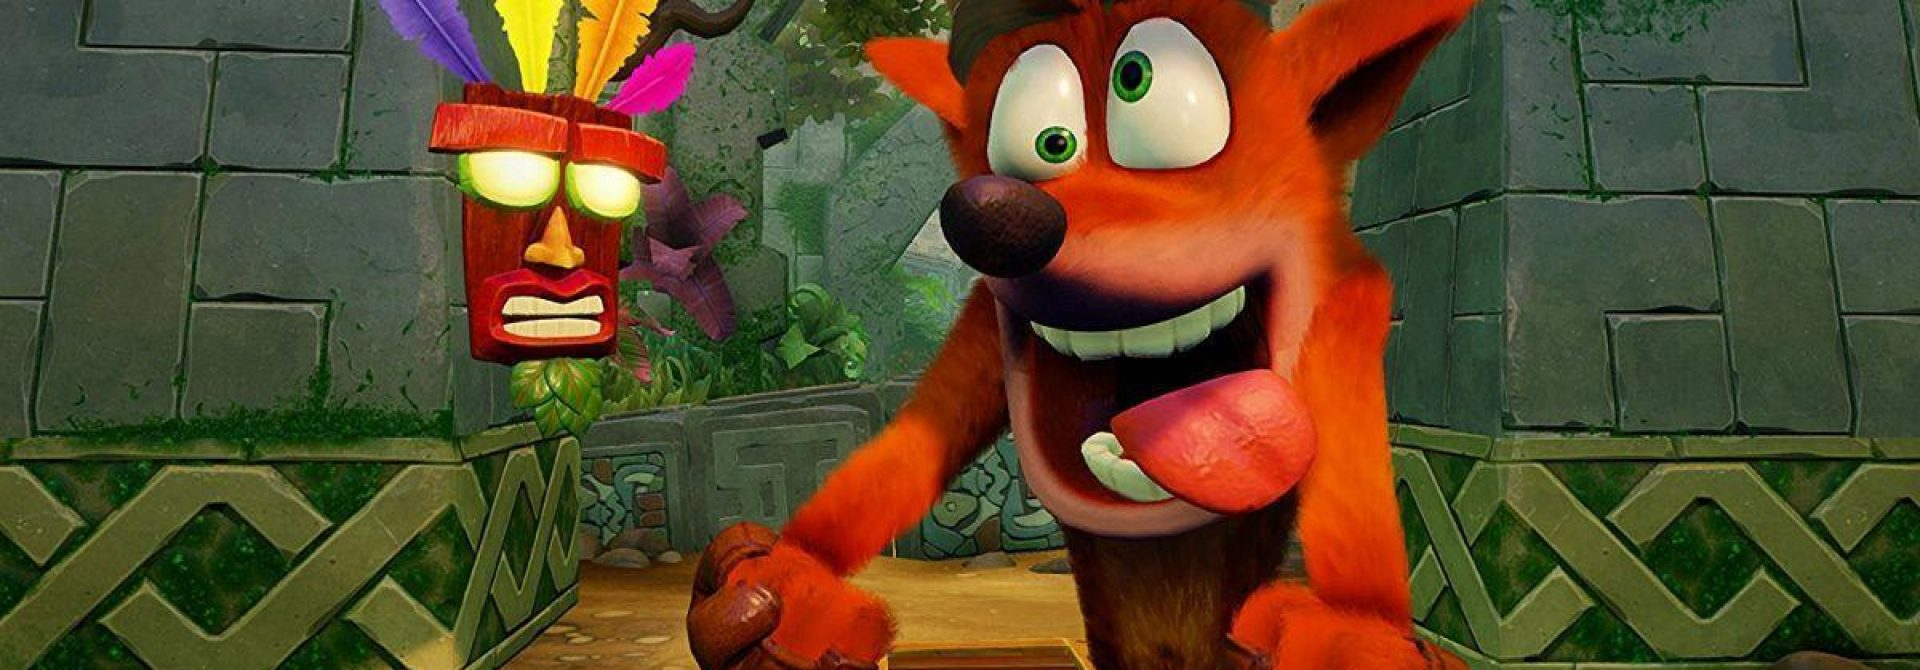 Crash Bandicoot N Sane Trilogy gets Demo